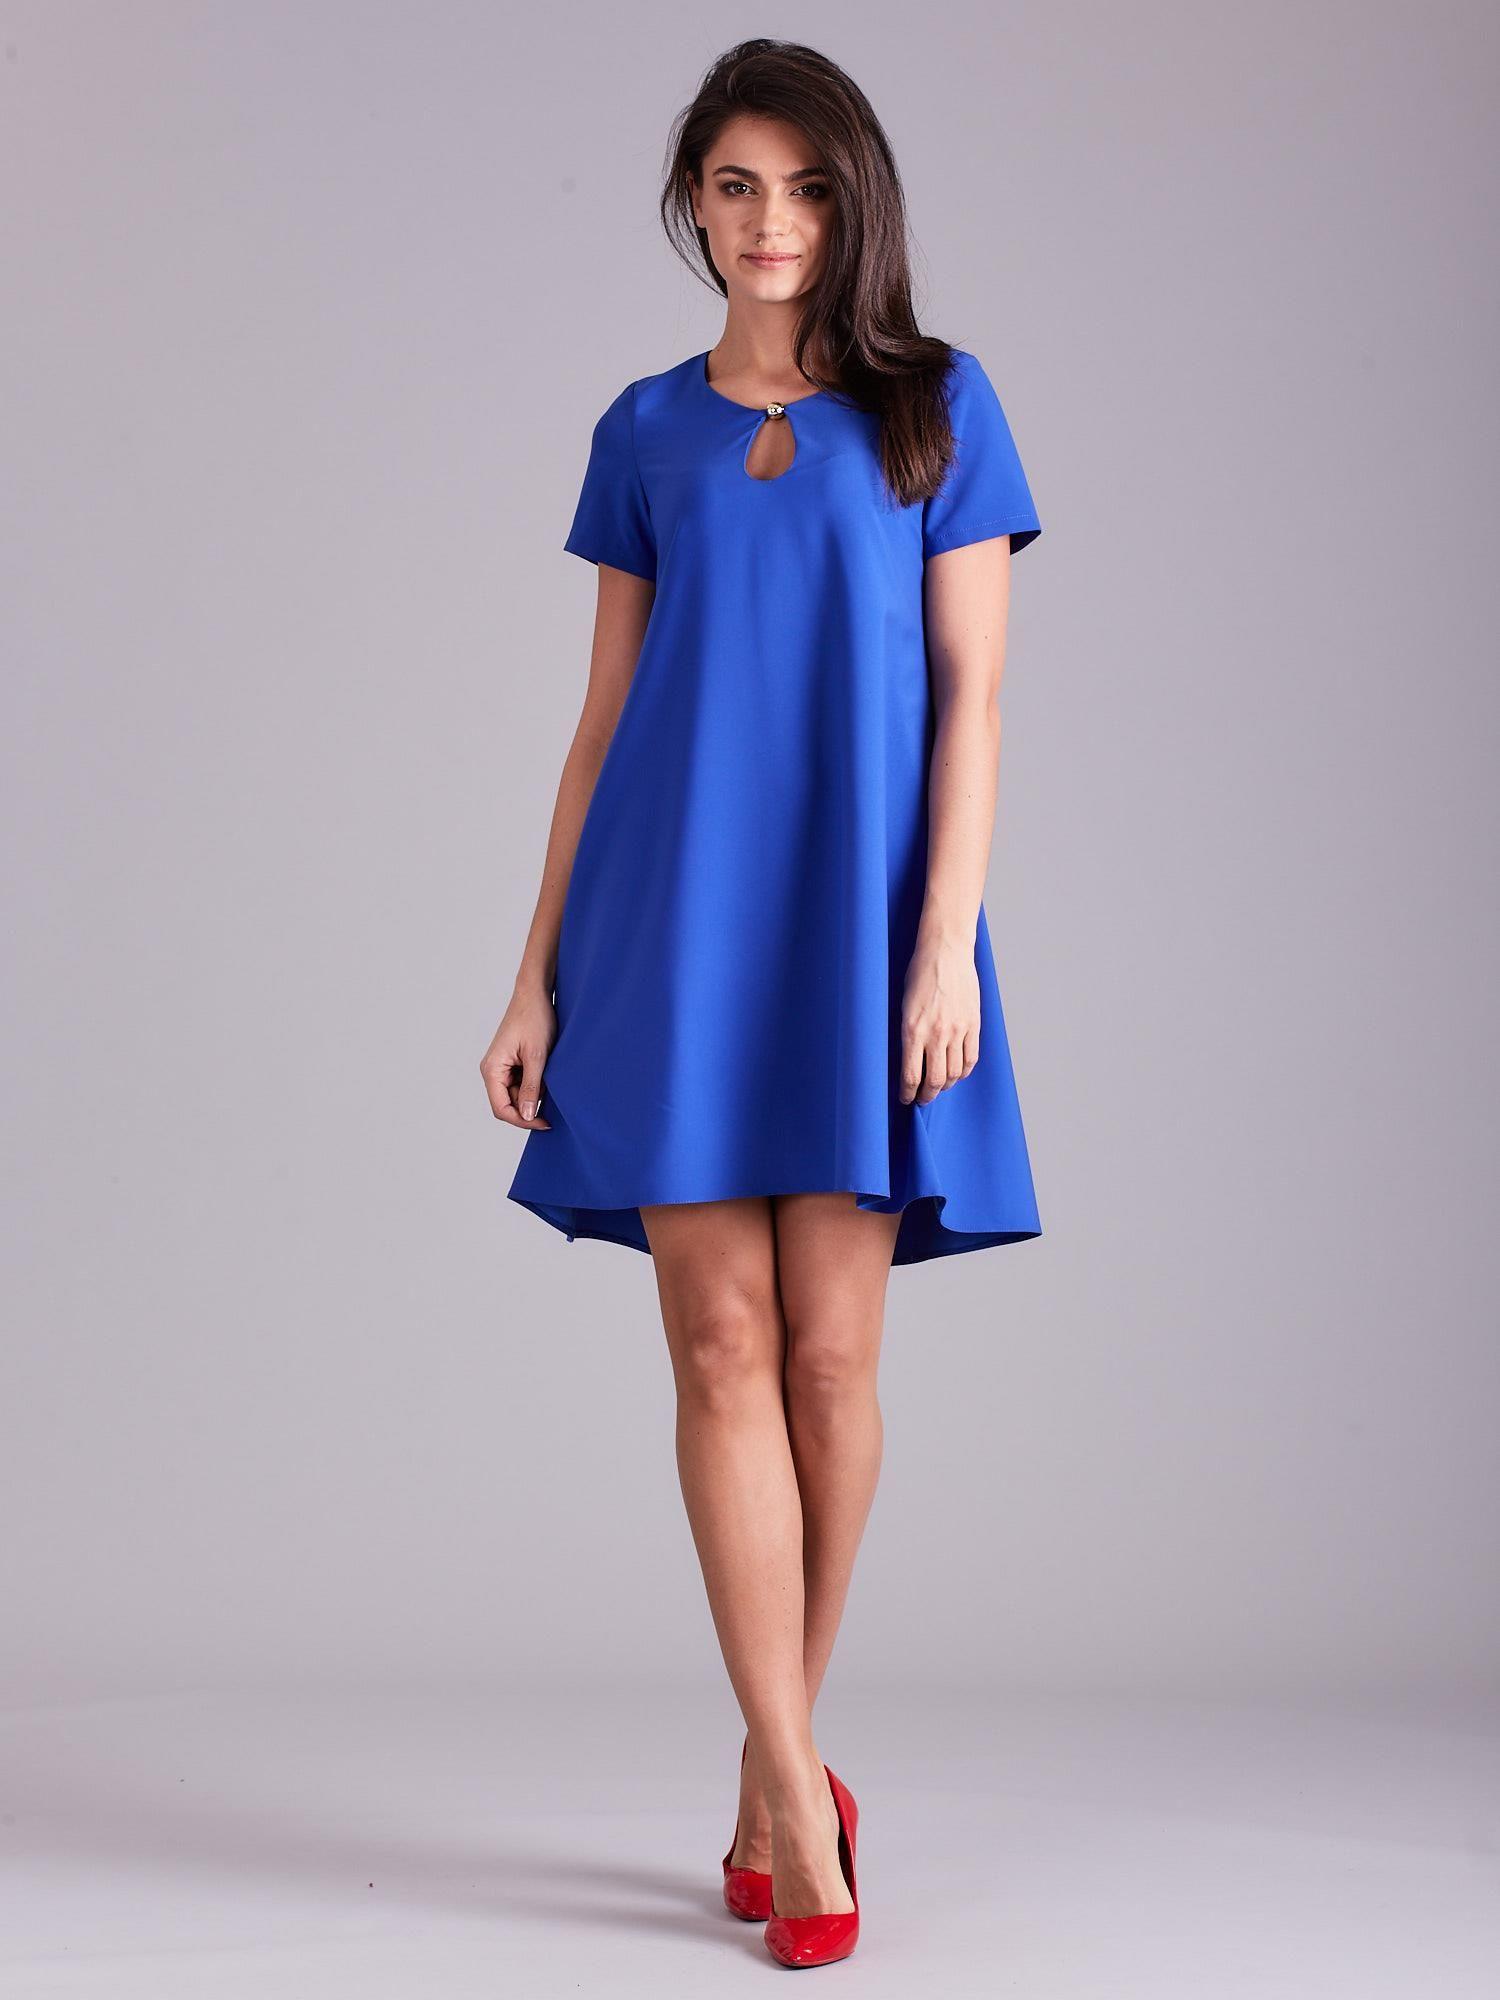 c323f10285 Kobaltowa luźna elegancka sukienka - Sukienka koktajlowa - sklep ...